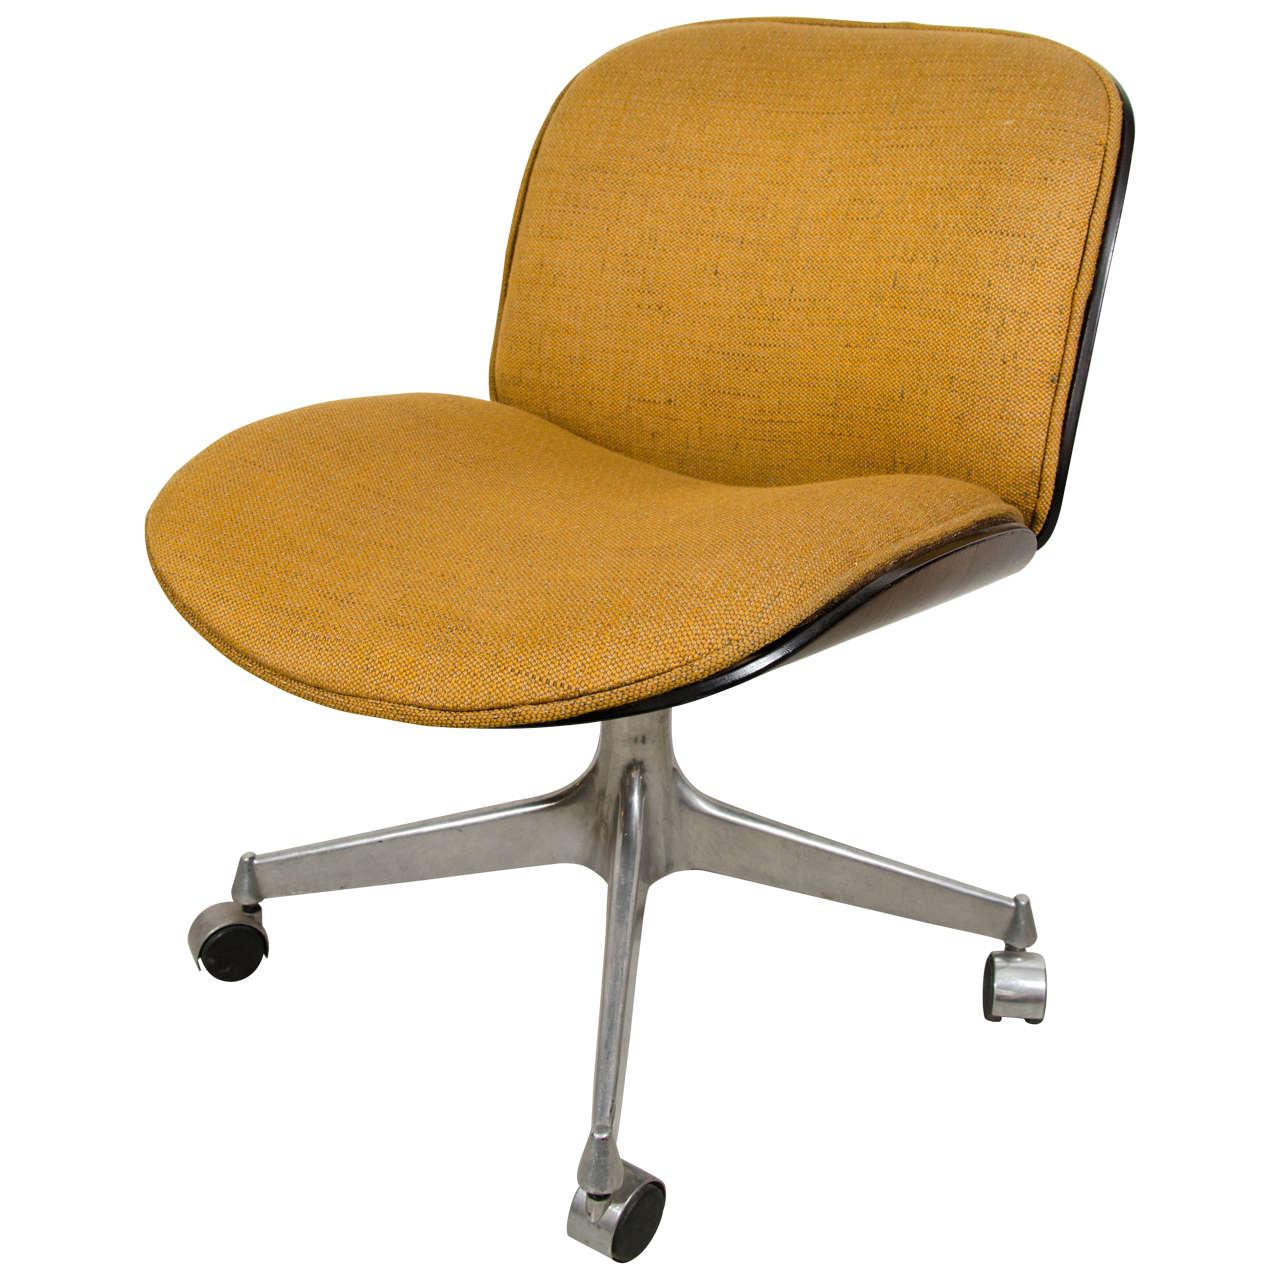 desk chair fabric sunbrella cushion ico parisi for mim with seat at 1stdibs